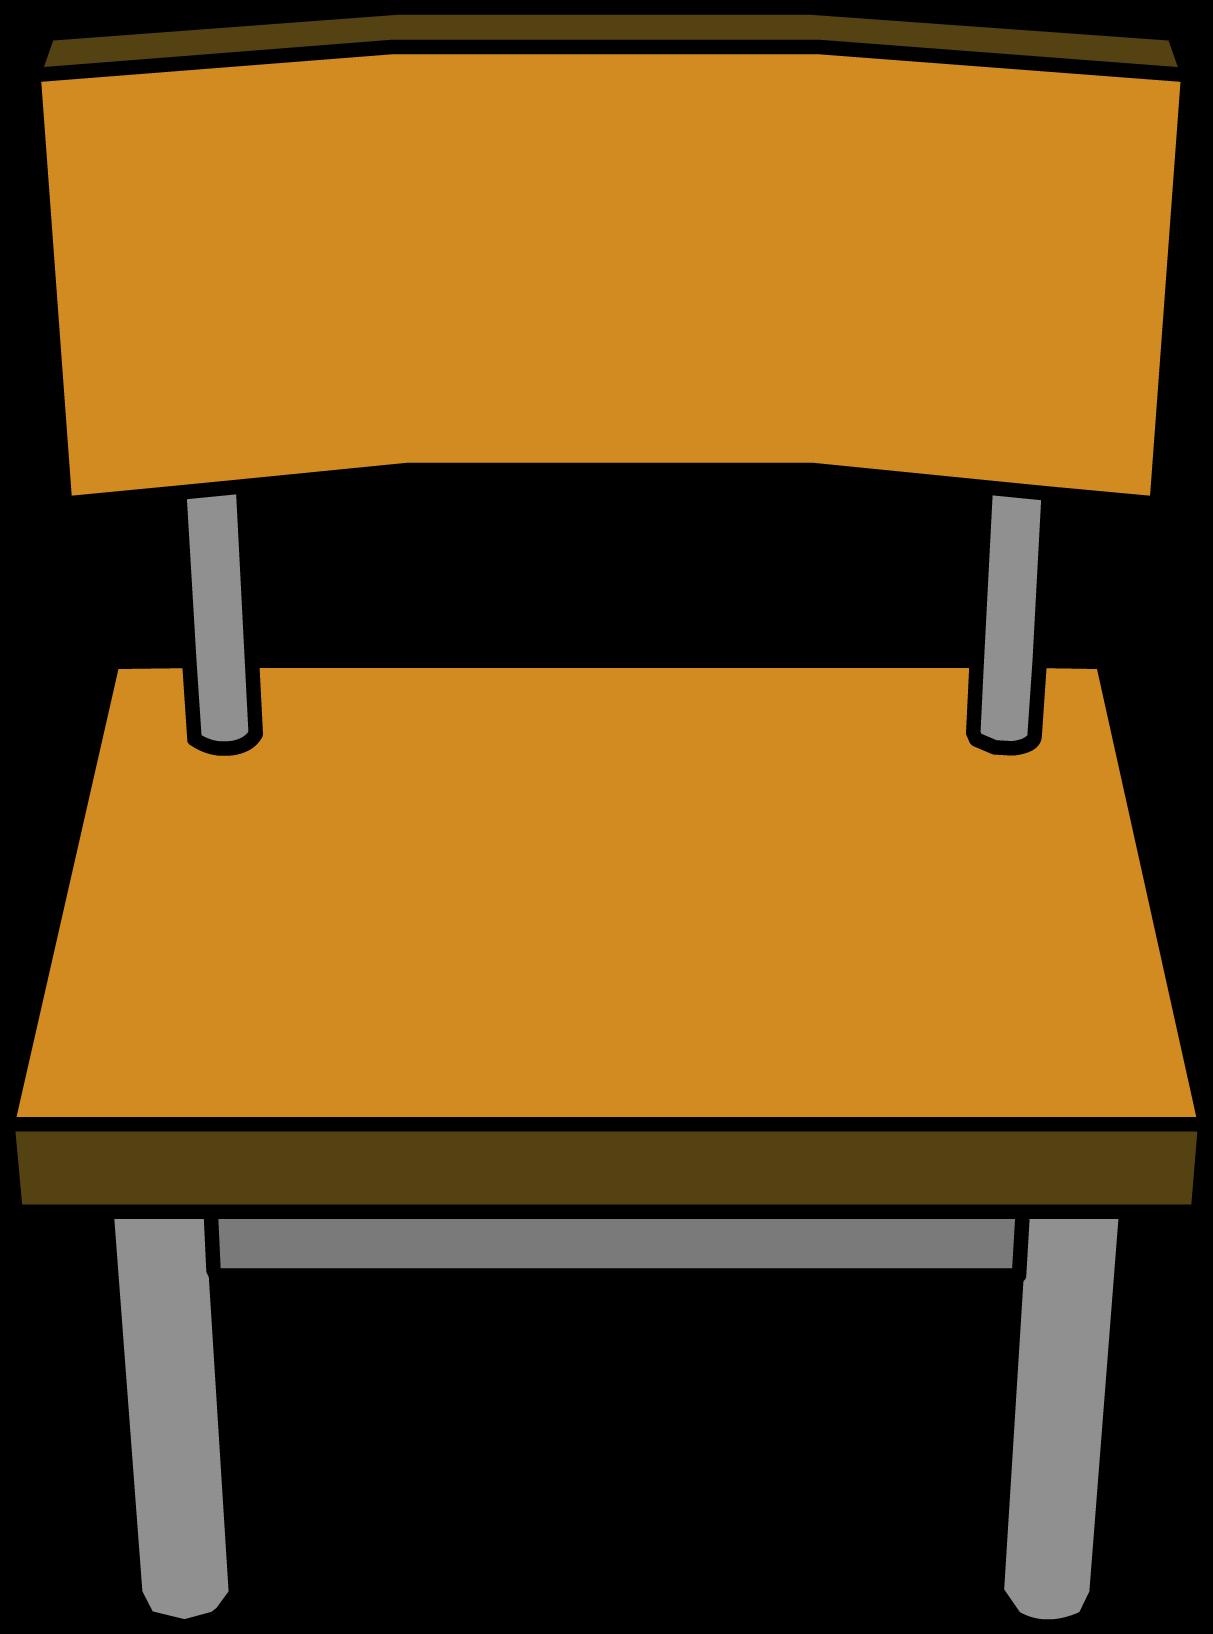 School chair clipart jpg free library Classroom Desk Clipart | Free download best Classroom Desk Clipart ... jpg free library